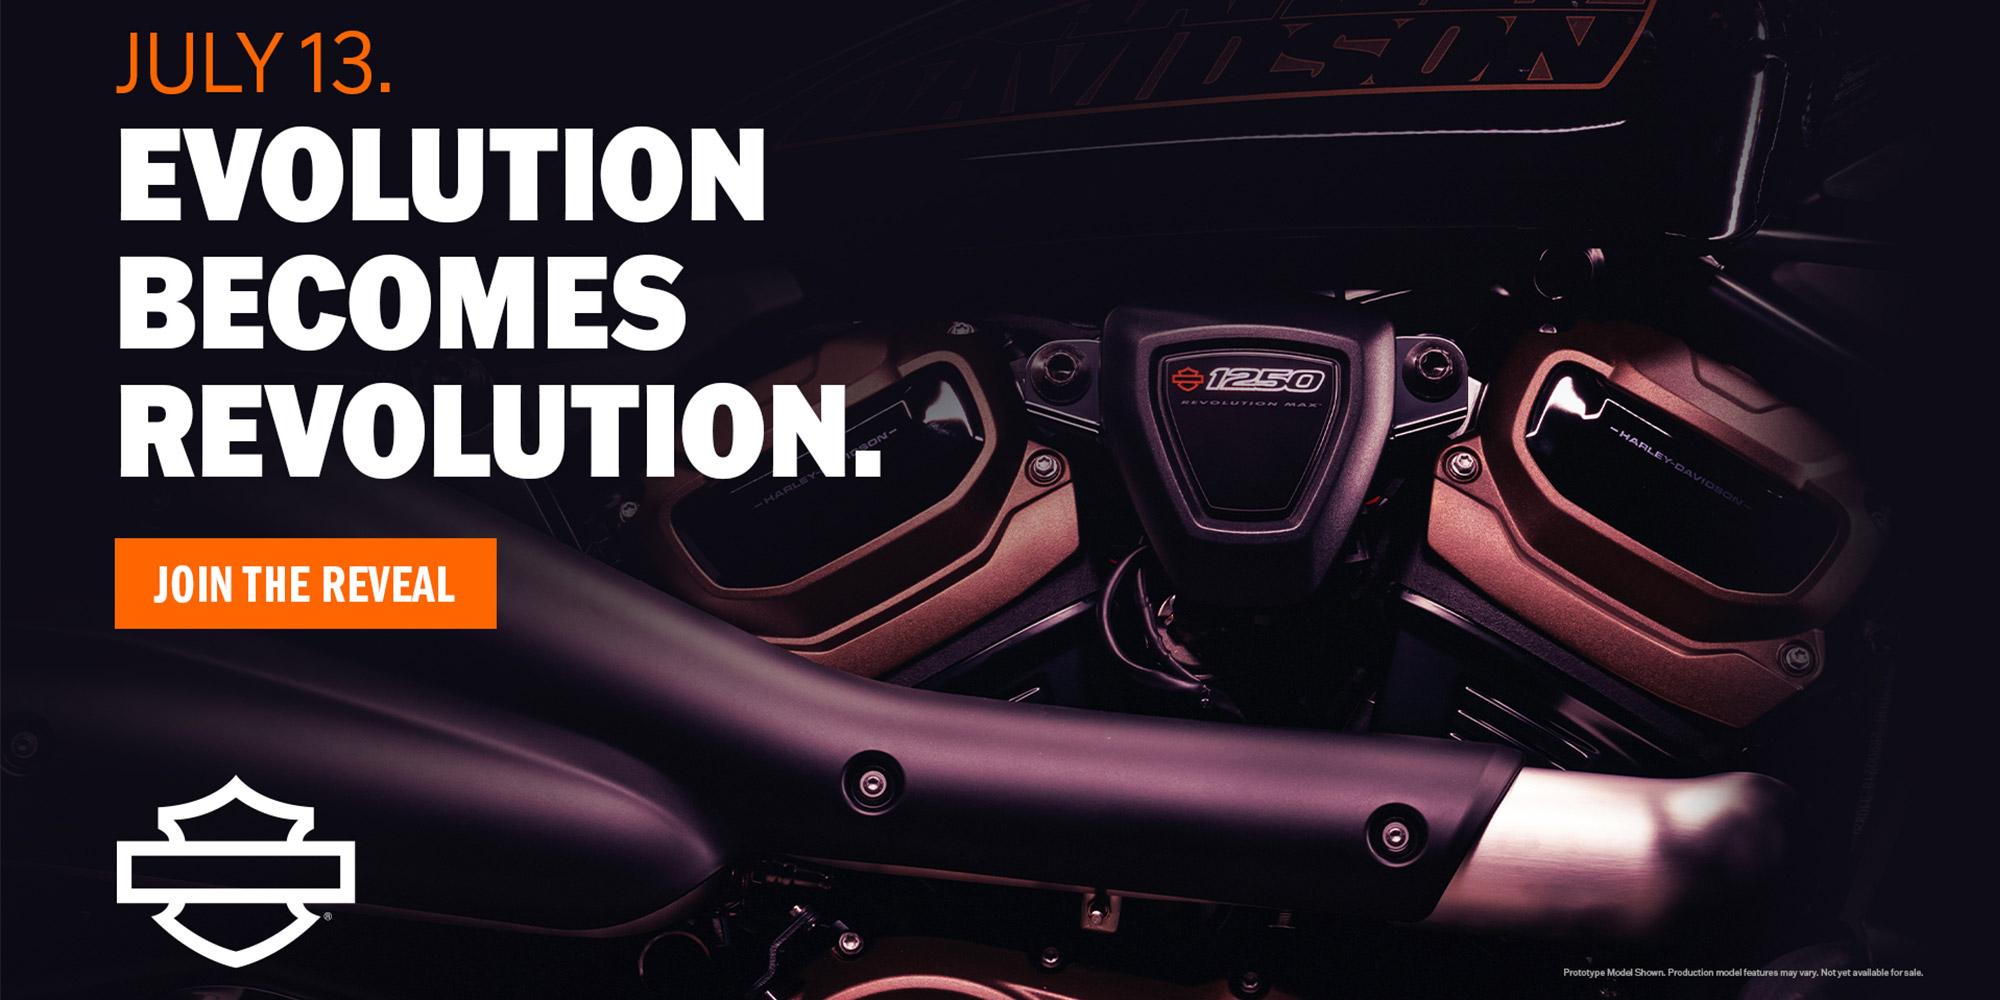 Harley New Model Reveal at Hot Rod Harley-Davidson